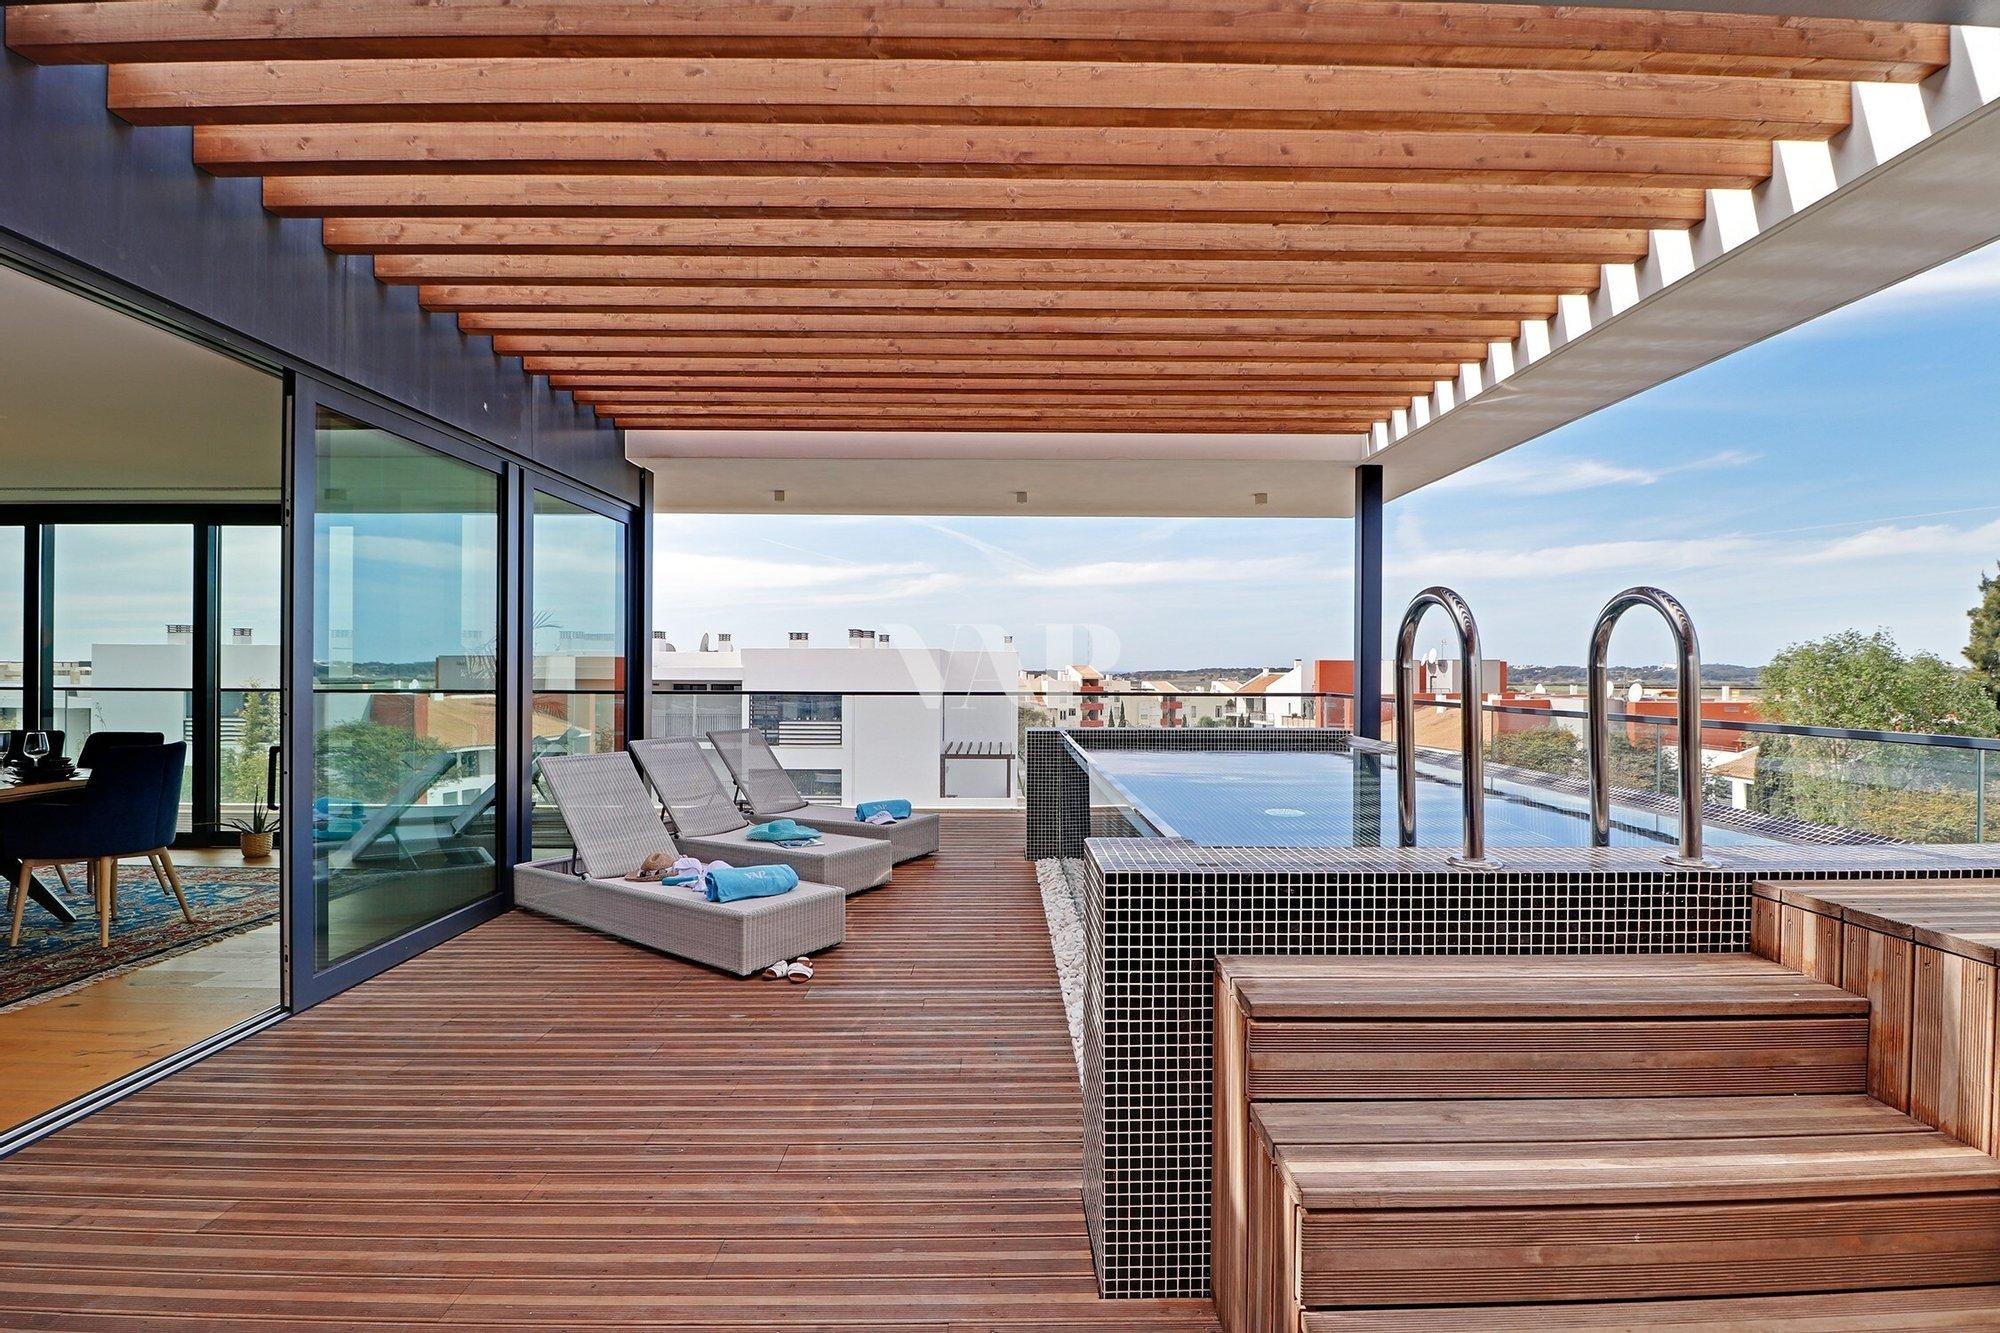 Апартаменты в Фаро, Фару, Португалия 1 - 11202962